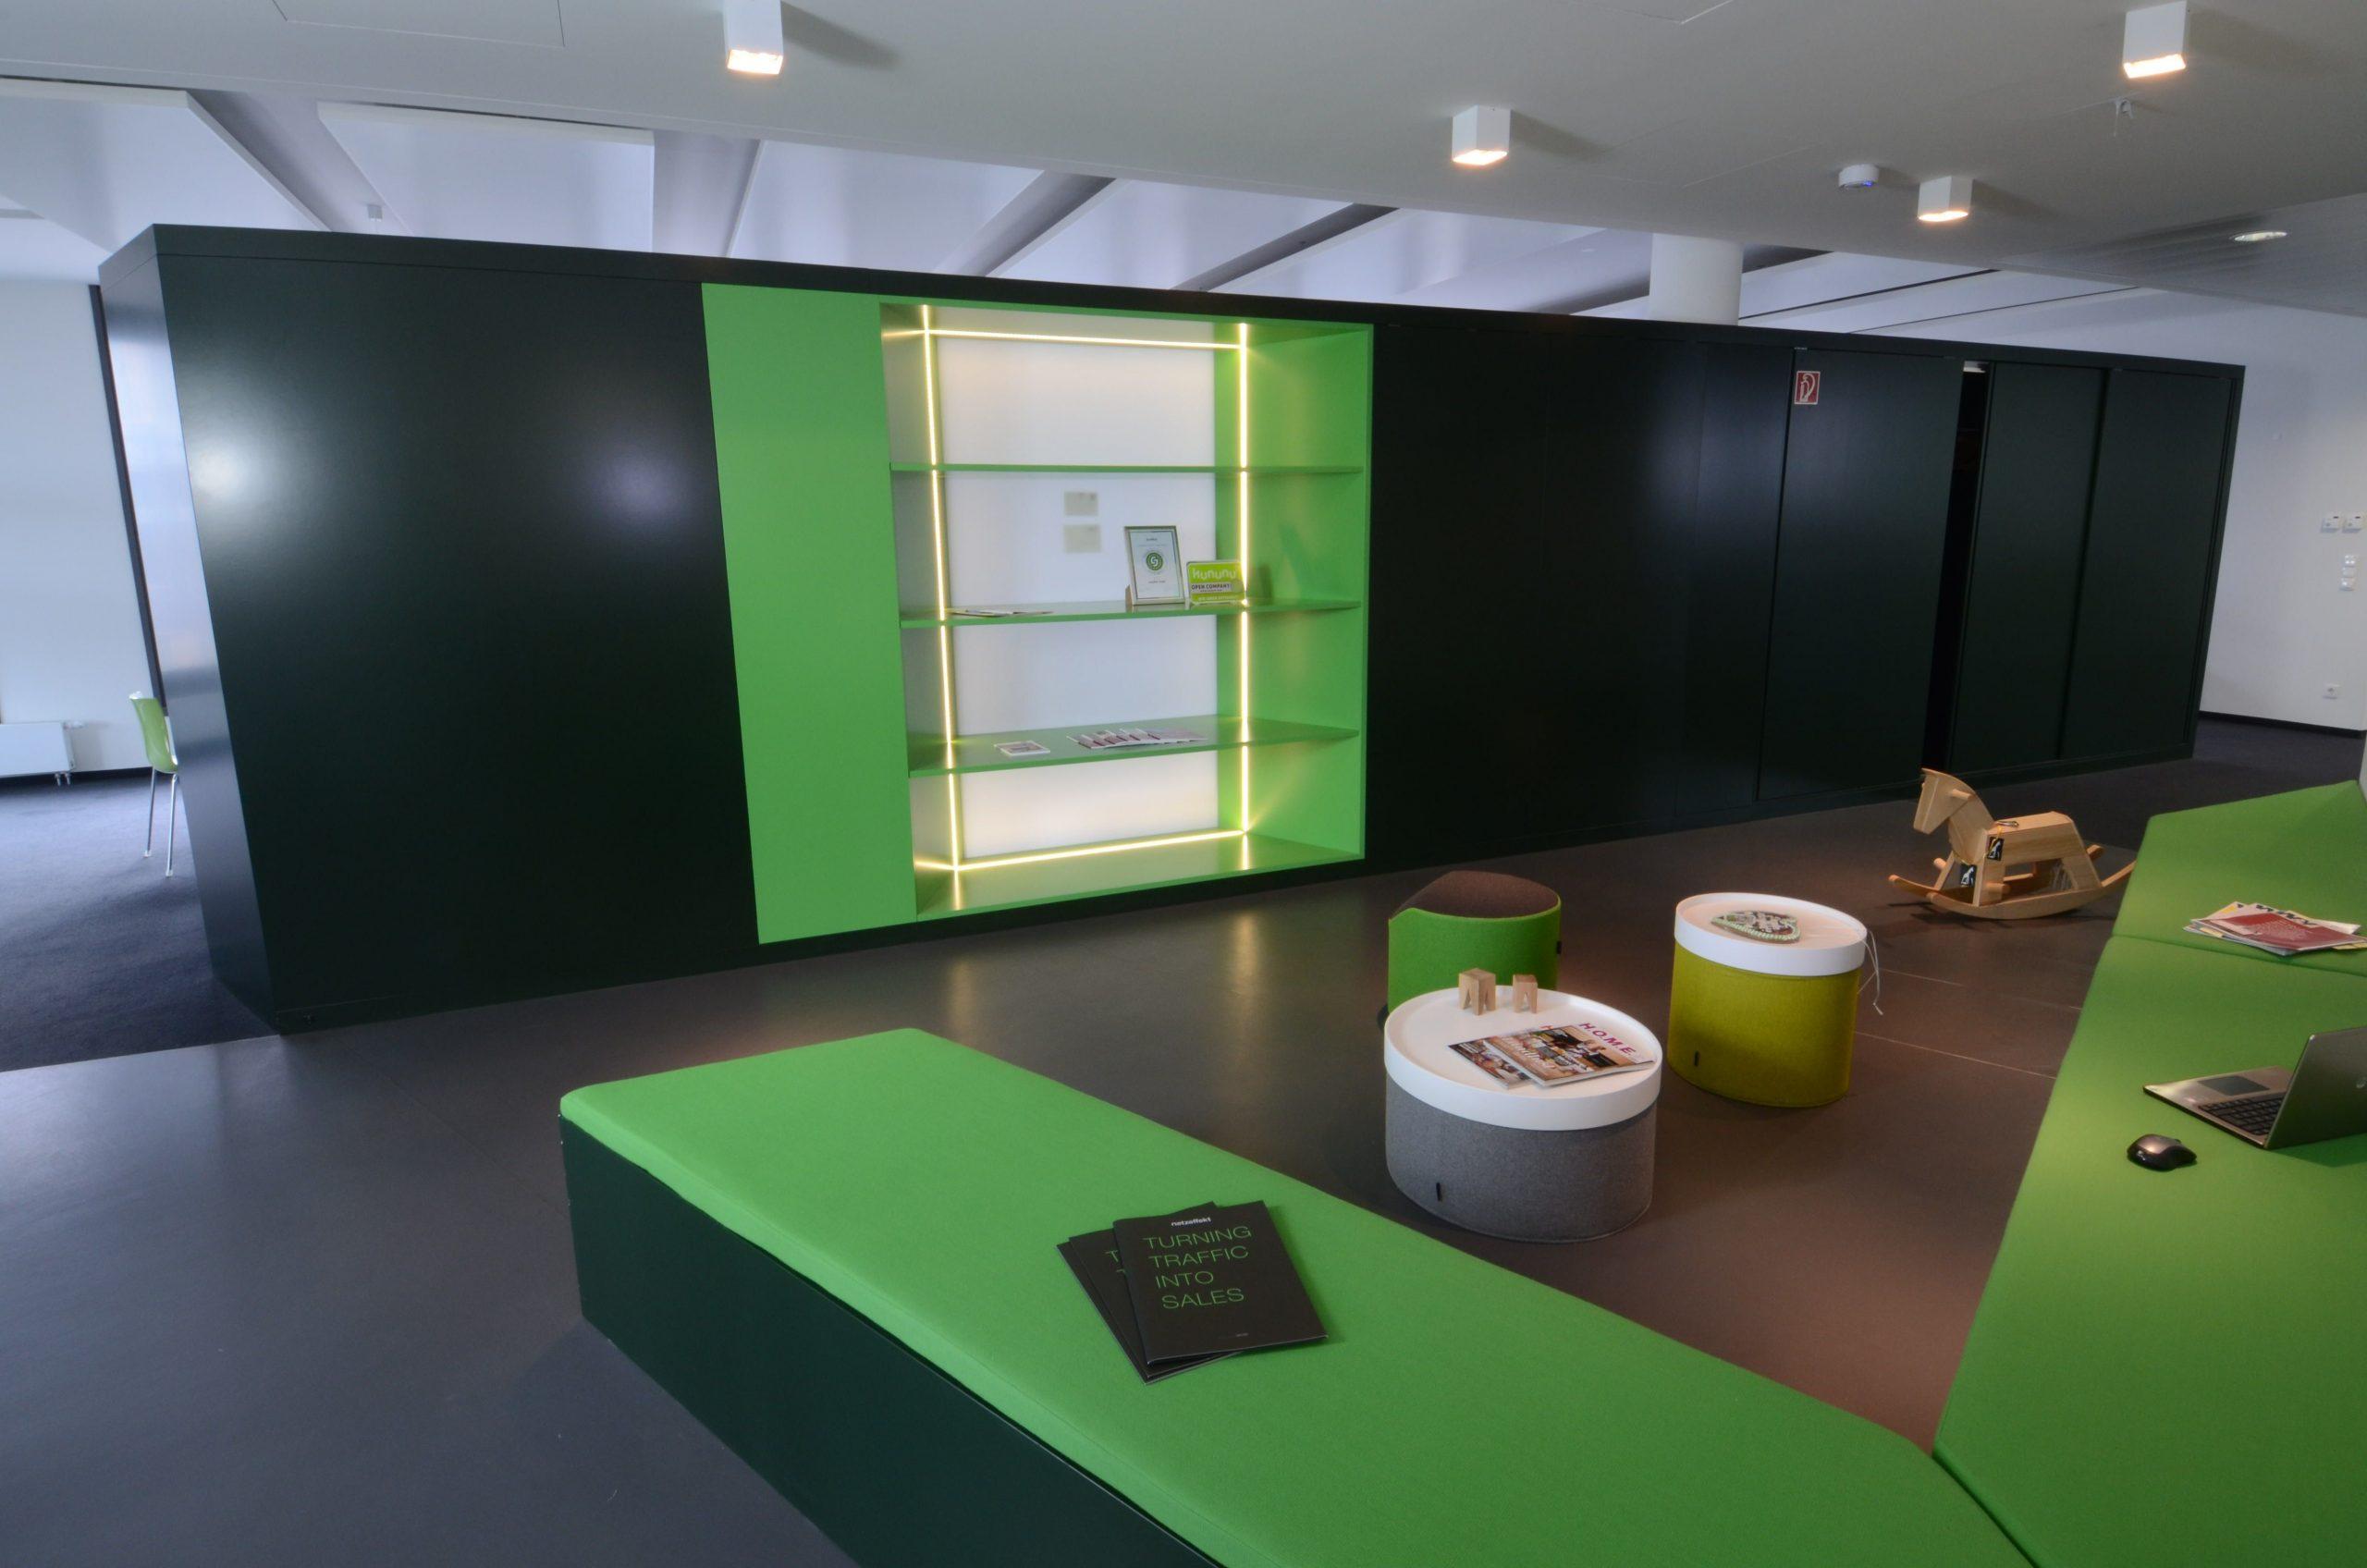 b ro design in m nchen manuela bross innenarchitektur. Black Bedroom Furniture Sets. Home Design Ideas